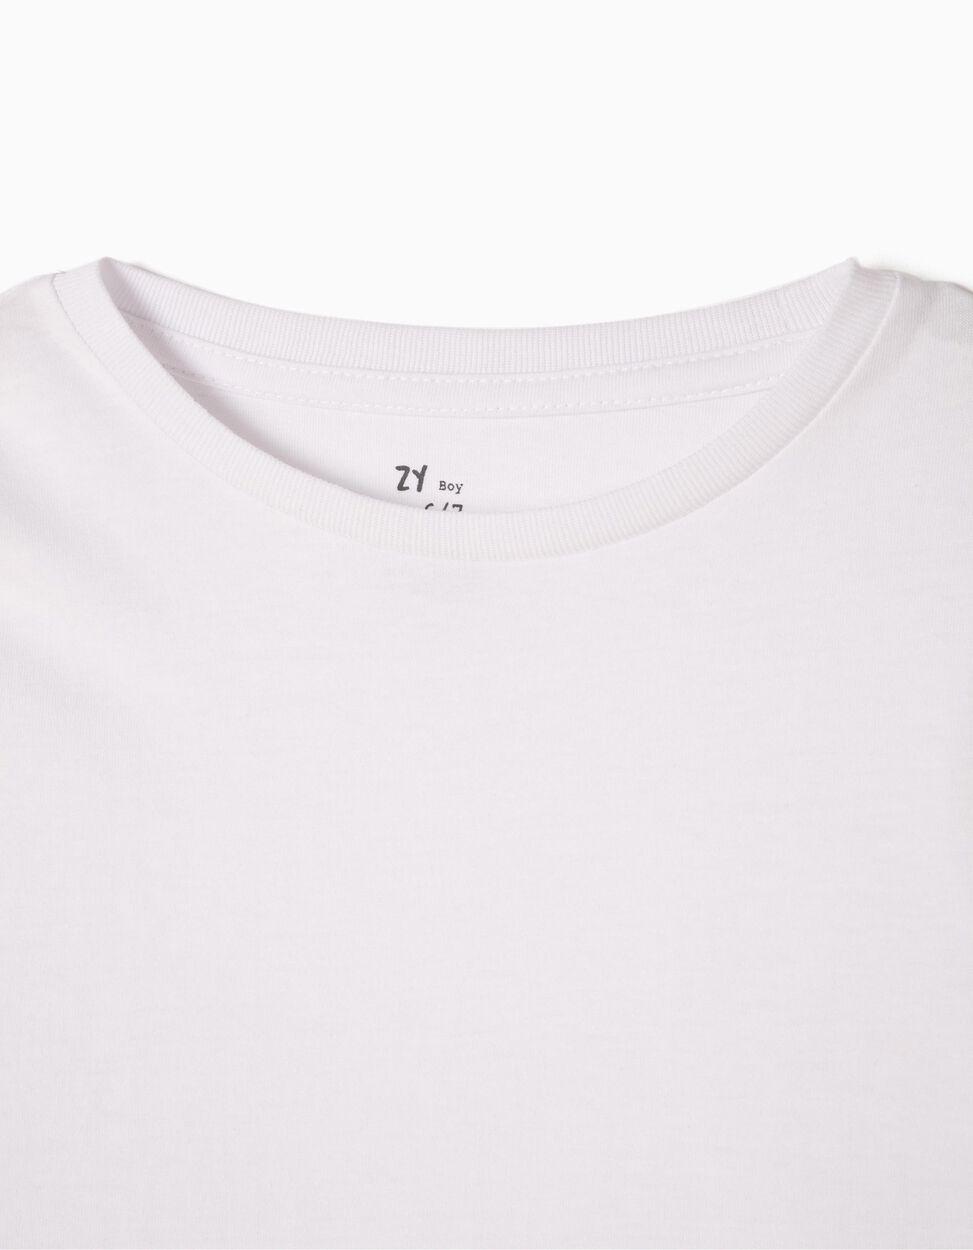 T-shirt Manga Comprida 96